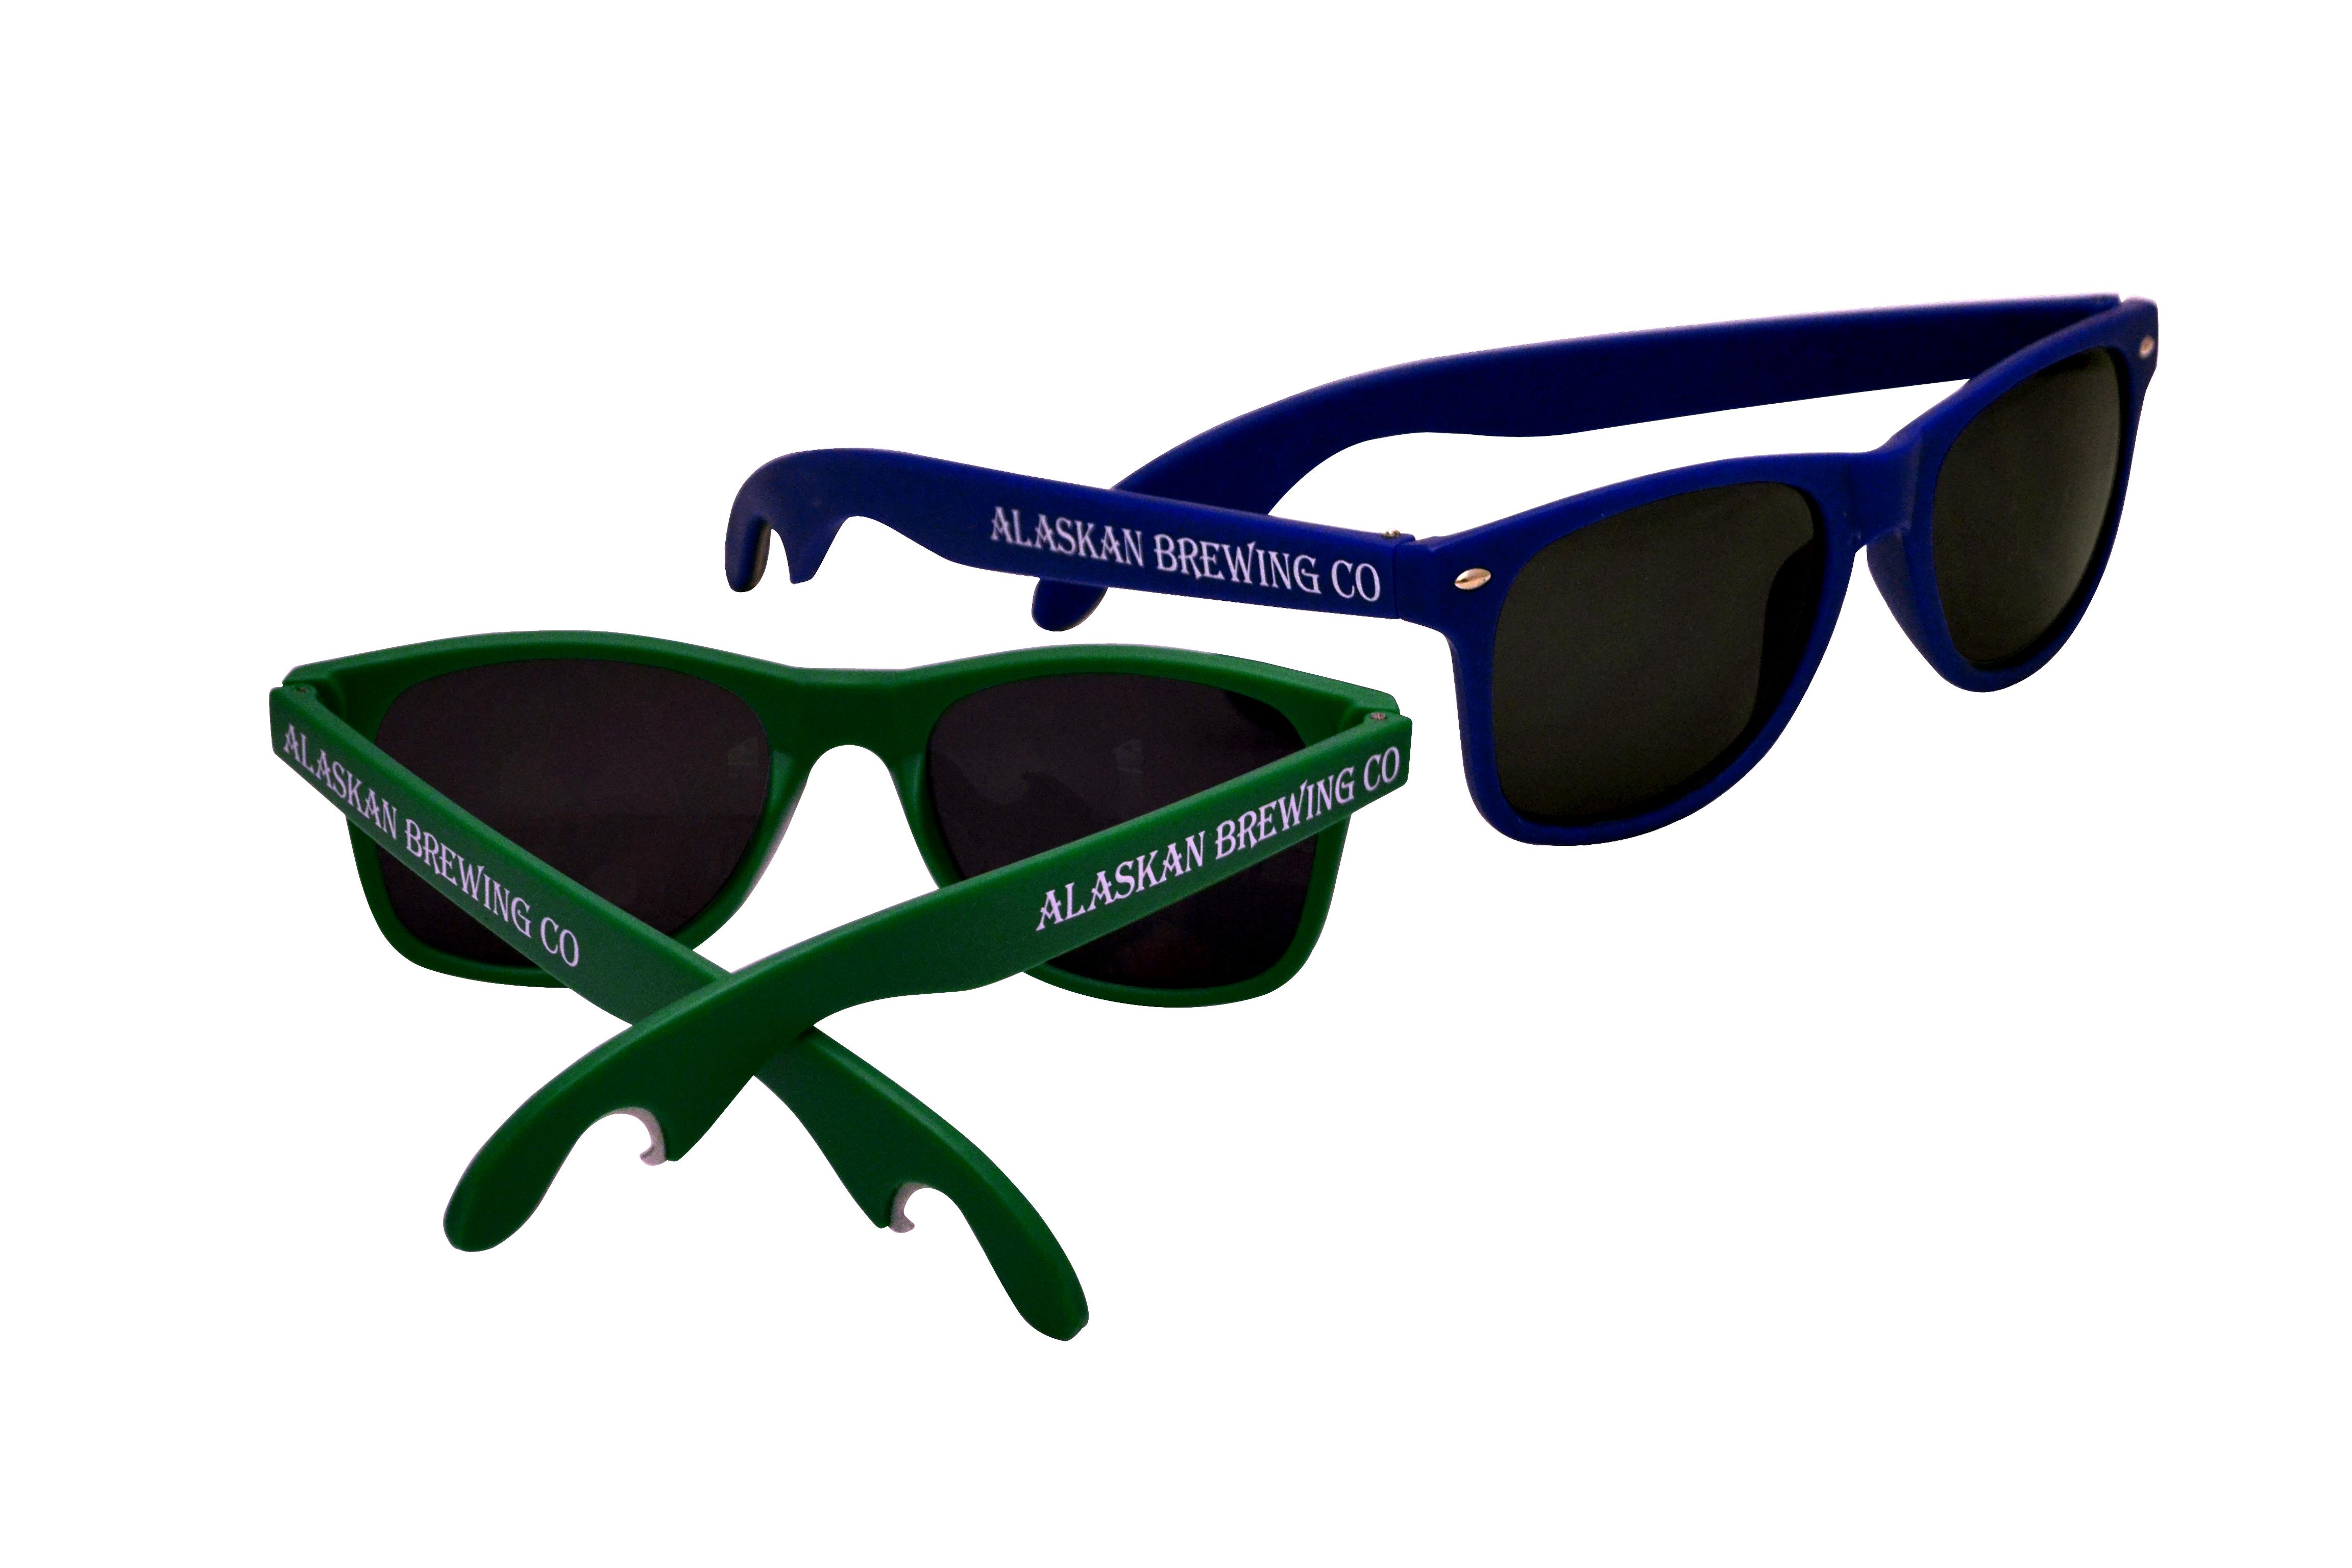 Alaskan Brewing Co. Sunglasses